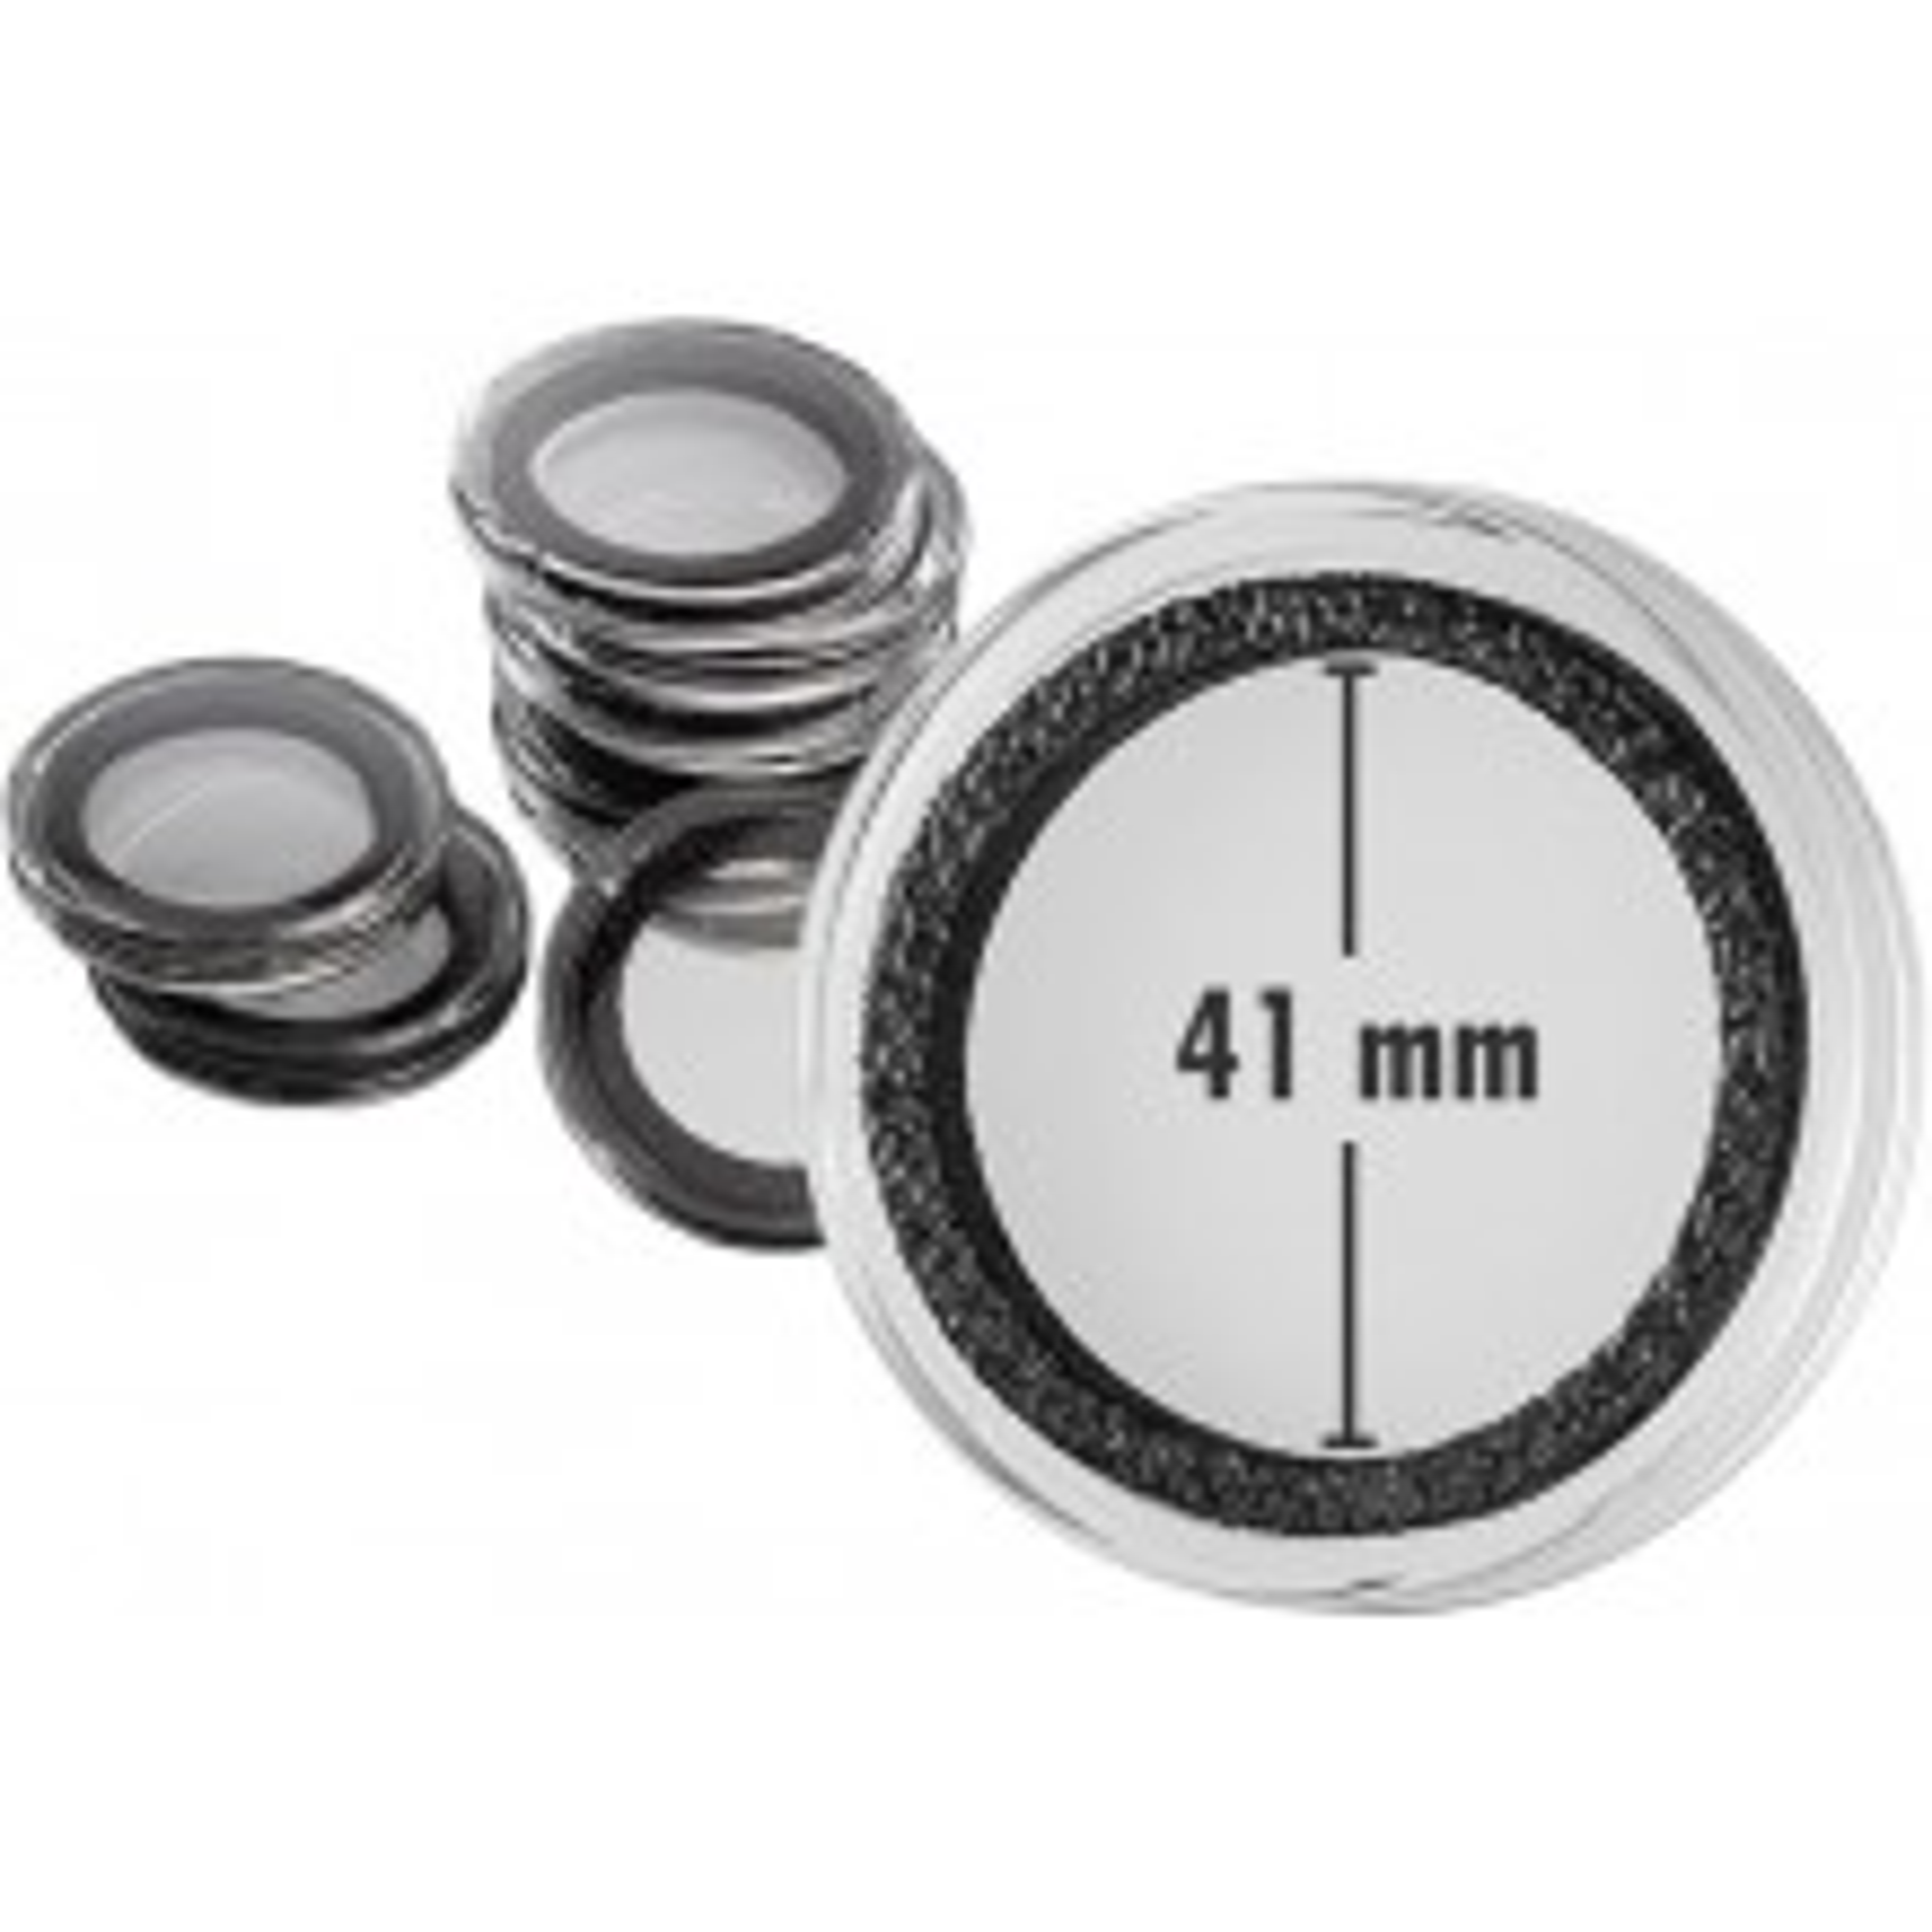 Doos van 10 stuks muntcapsule 41 mm Intercept